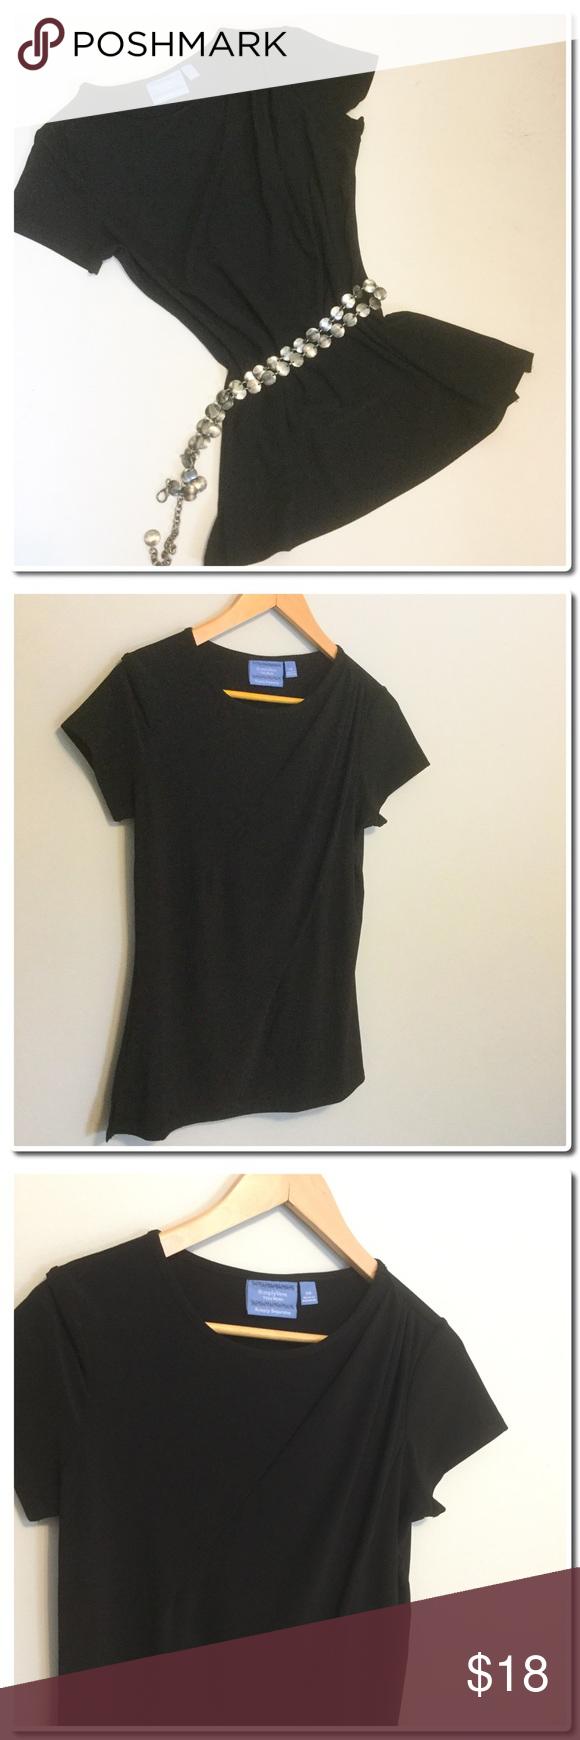 Simply Vera Wang Drape Front Blouse Simply Vera Wang Drape Front Blouse- Worn Once - Shirt sleeves -Side vents-96% Polyester 4% Spandex - Machine Wash- Tumble Low Simply Vera Vera Wang Tops